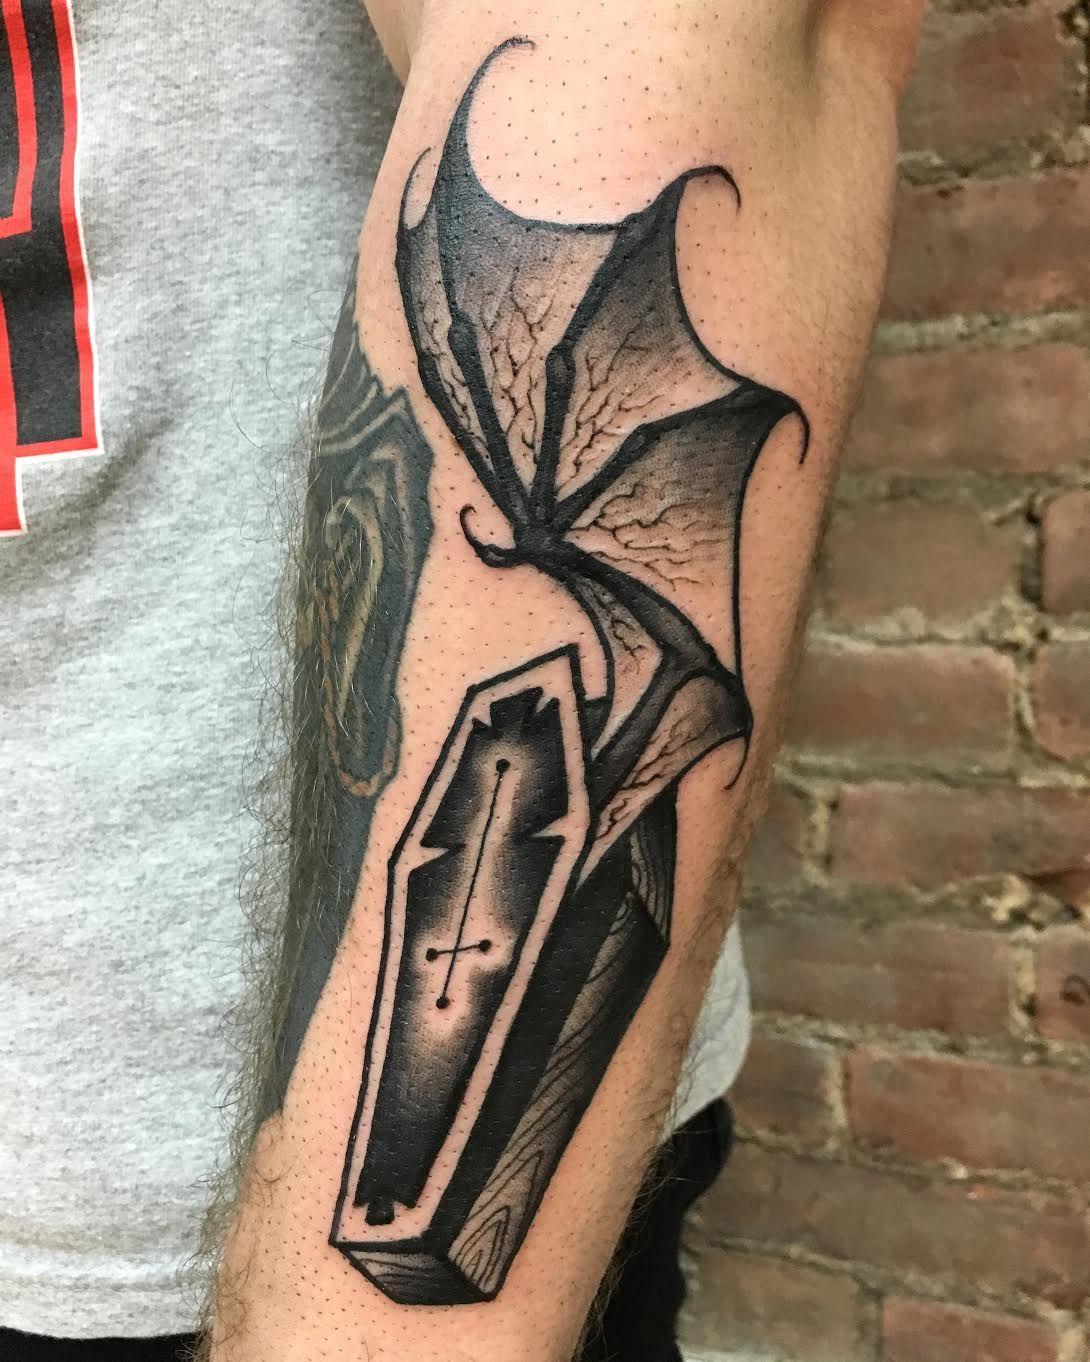 Coffin Tattoo Meaning : coffin, tattoo, meaning, Coffin, Tattoos, Surprisingly, Creative, Meanings, TattoosWin, Tattoo,, Tattoo, Design,, Creepy